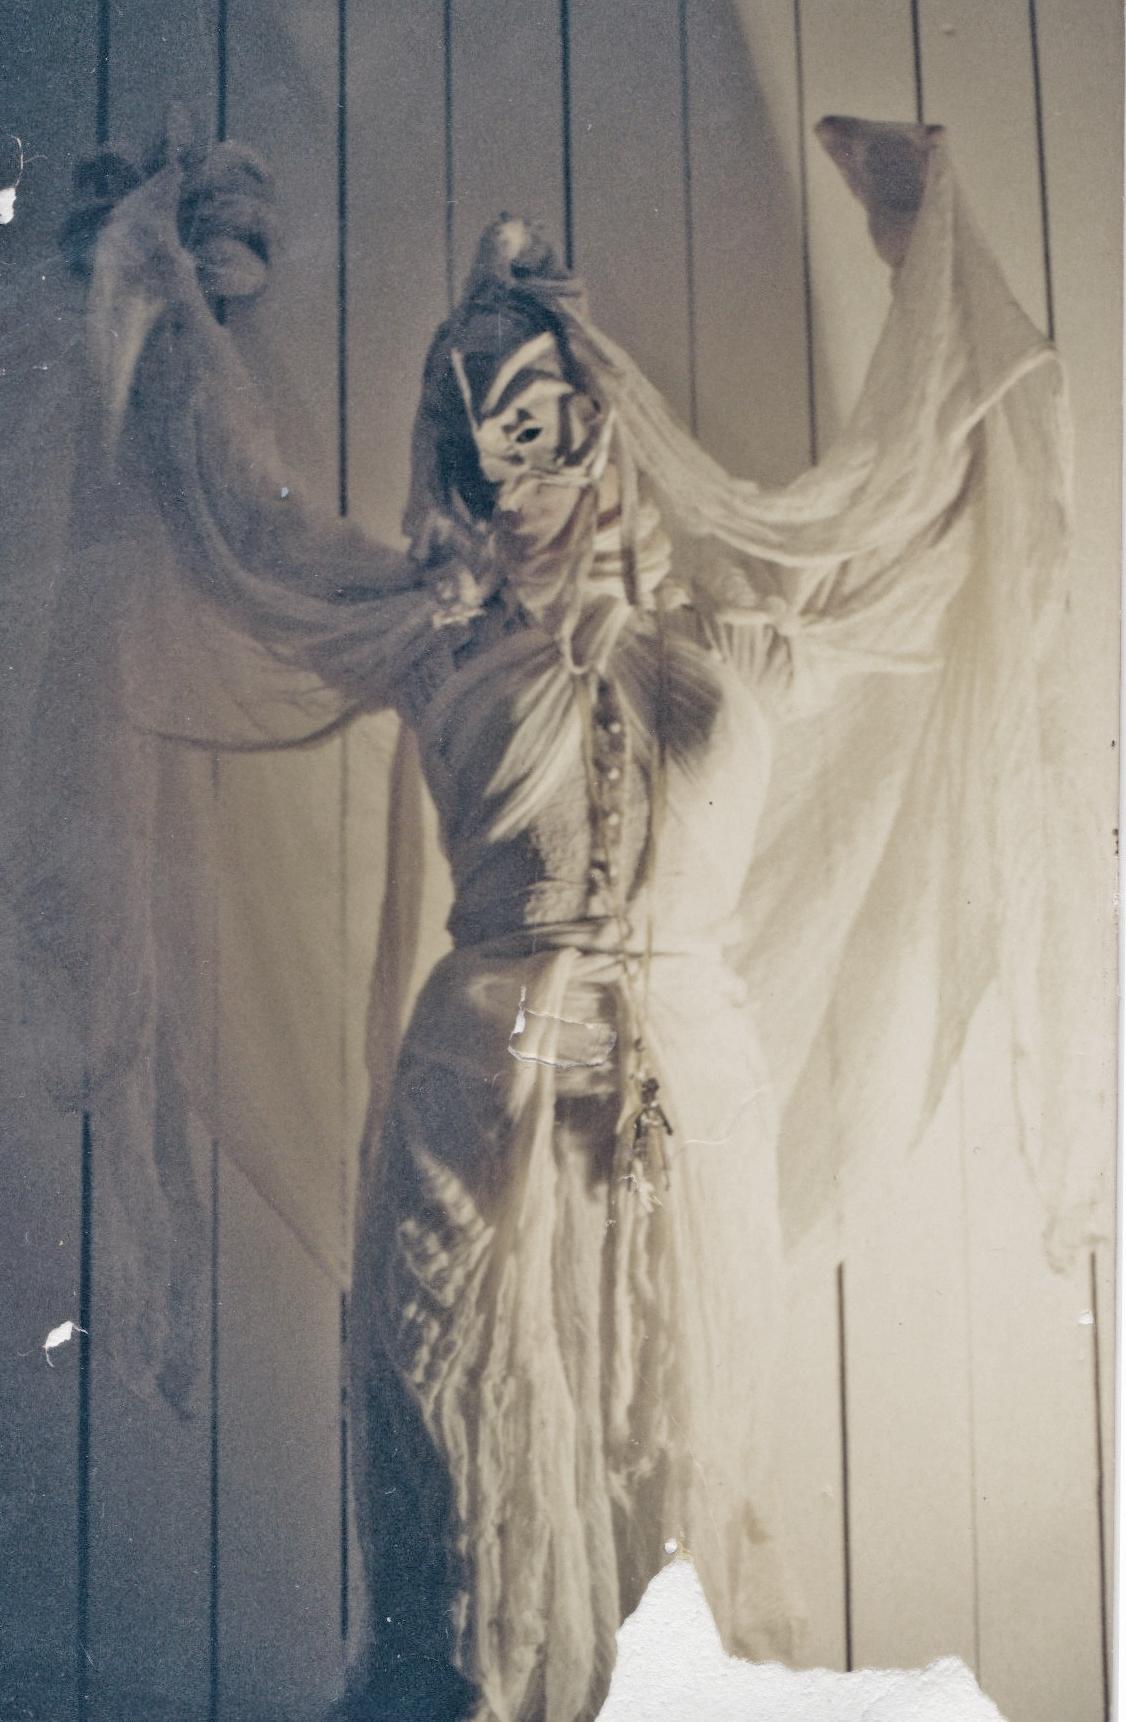 HalloweenOslo92